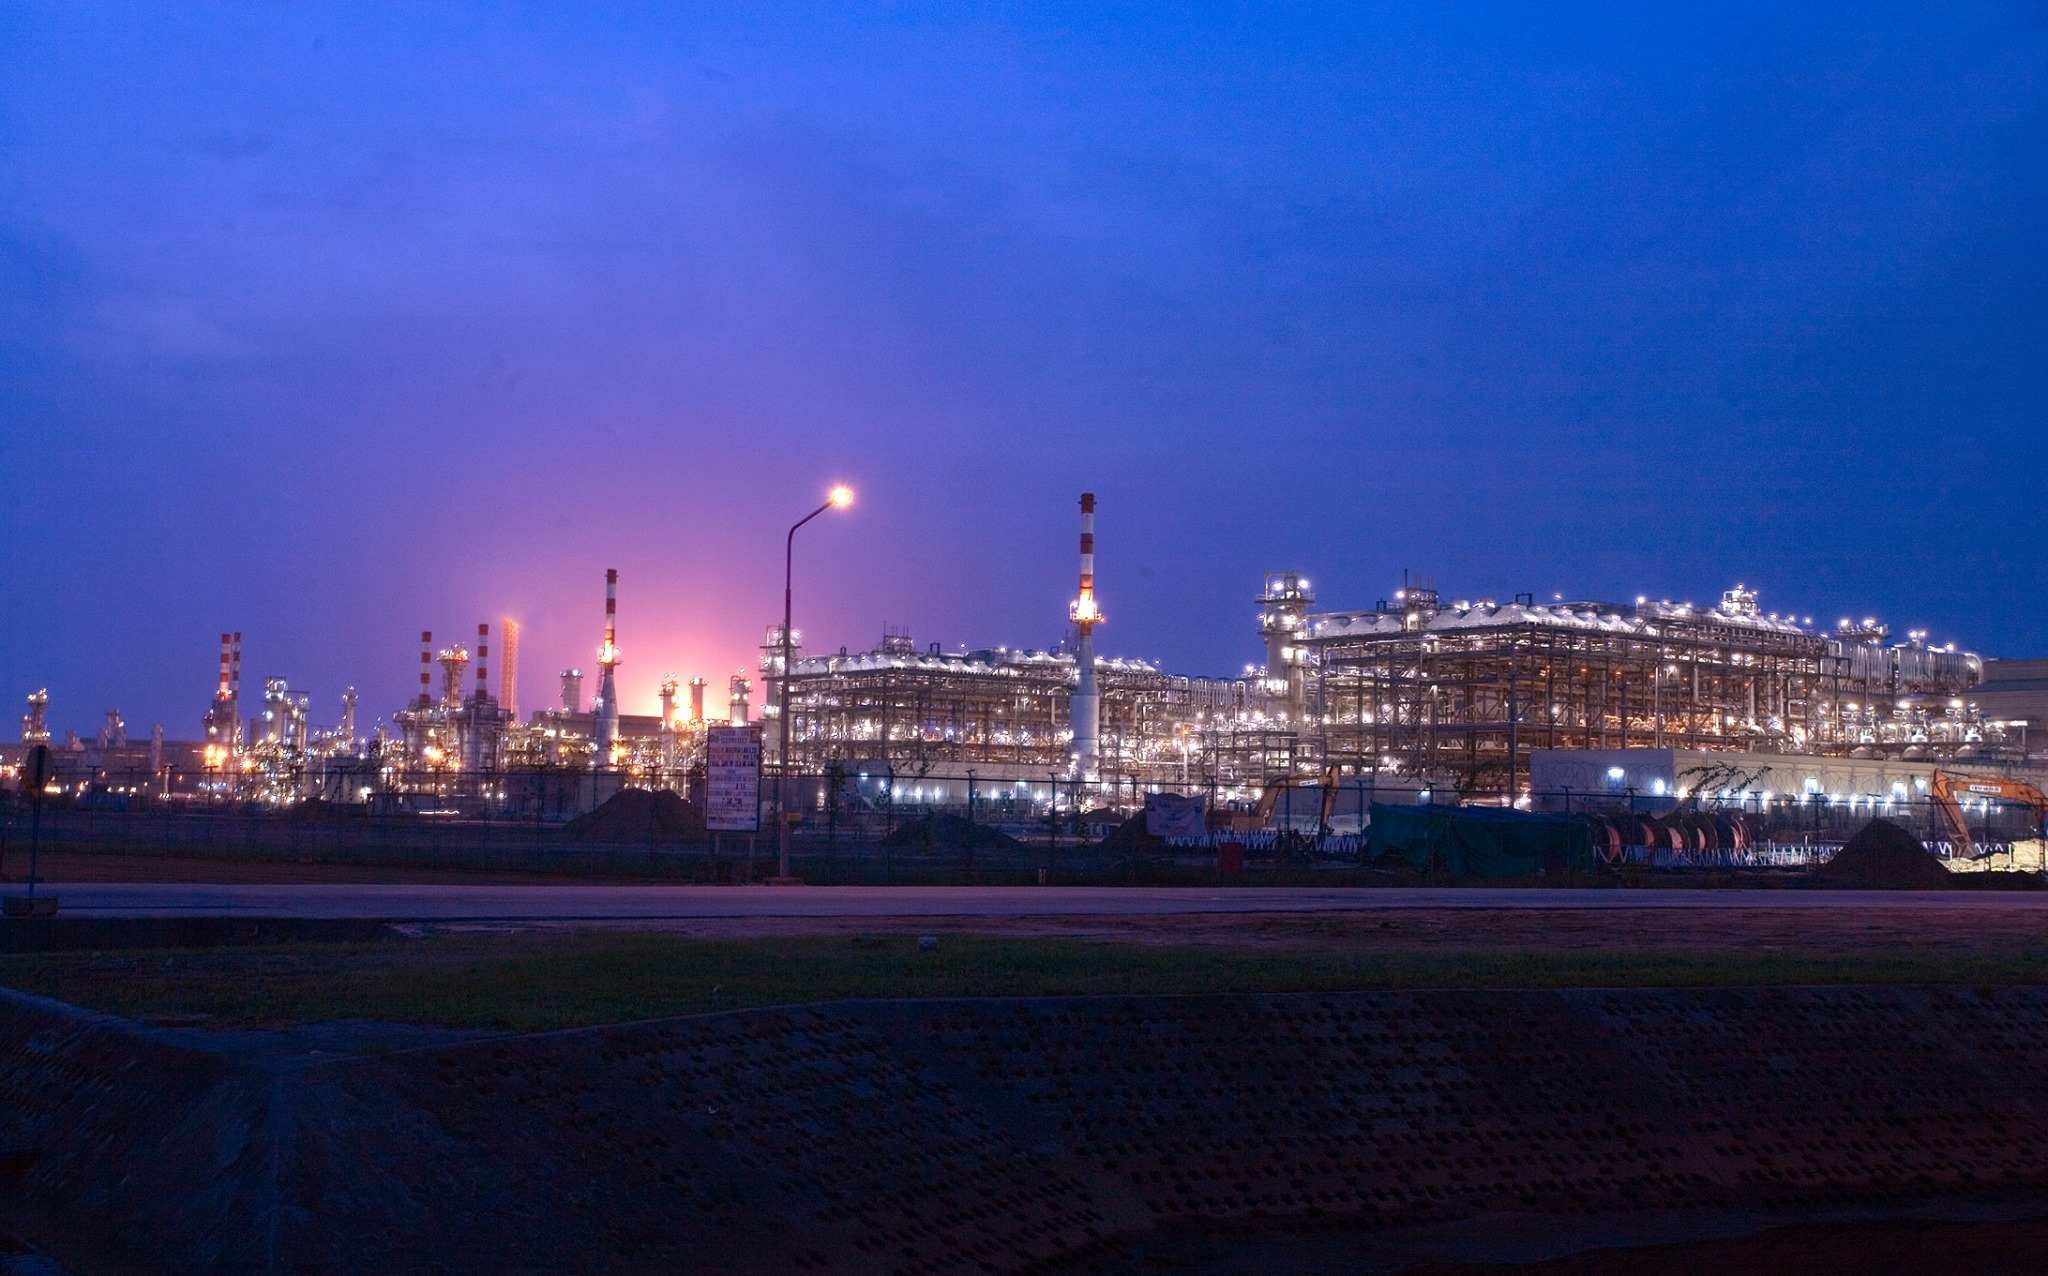 Industrial plant at night against dark blue sky